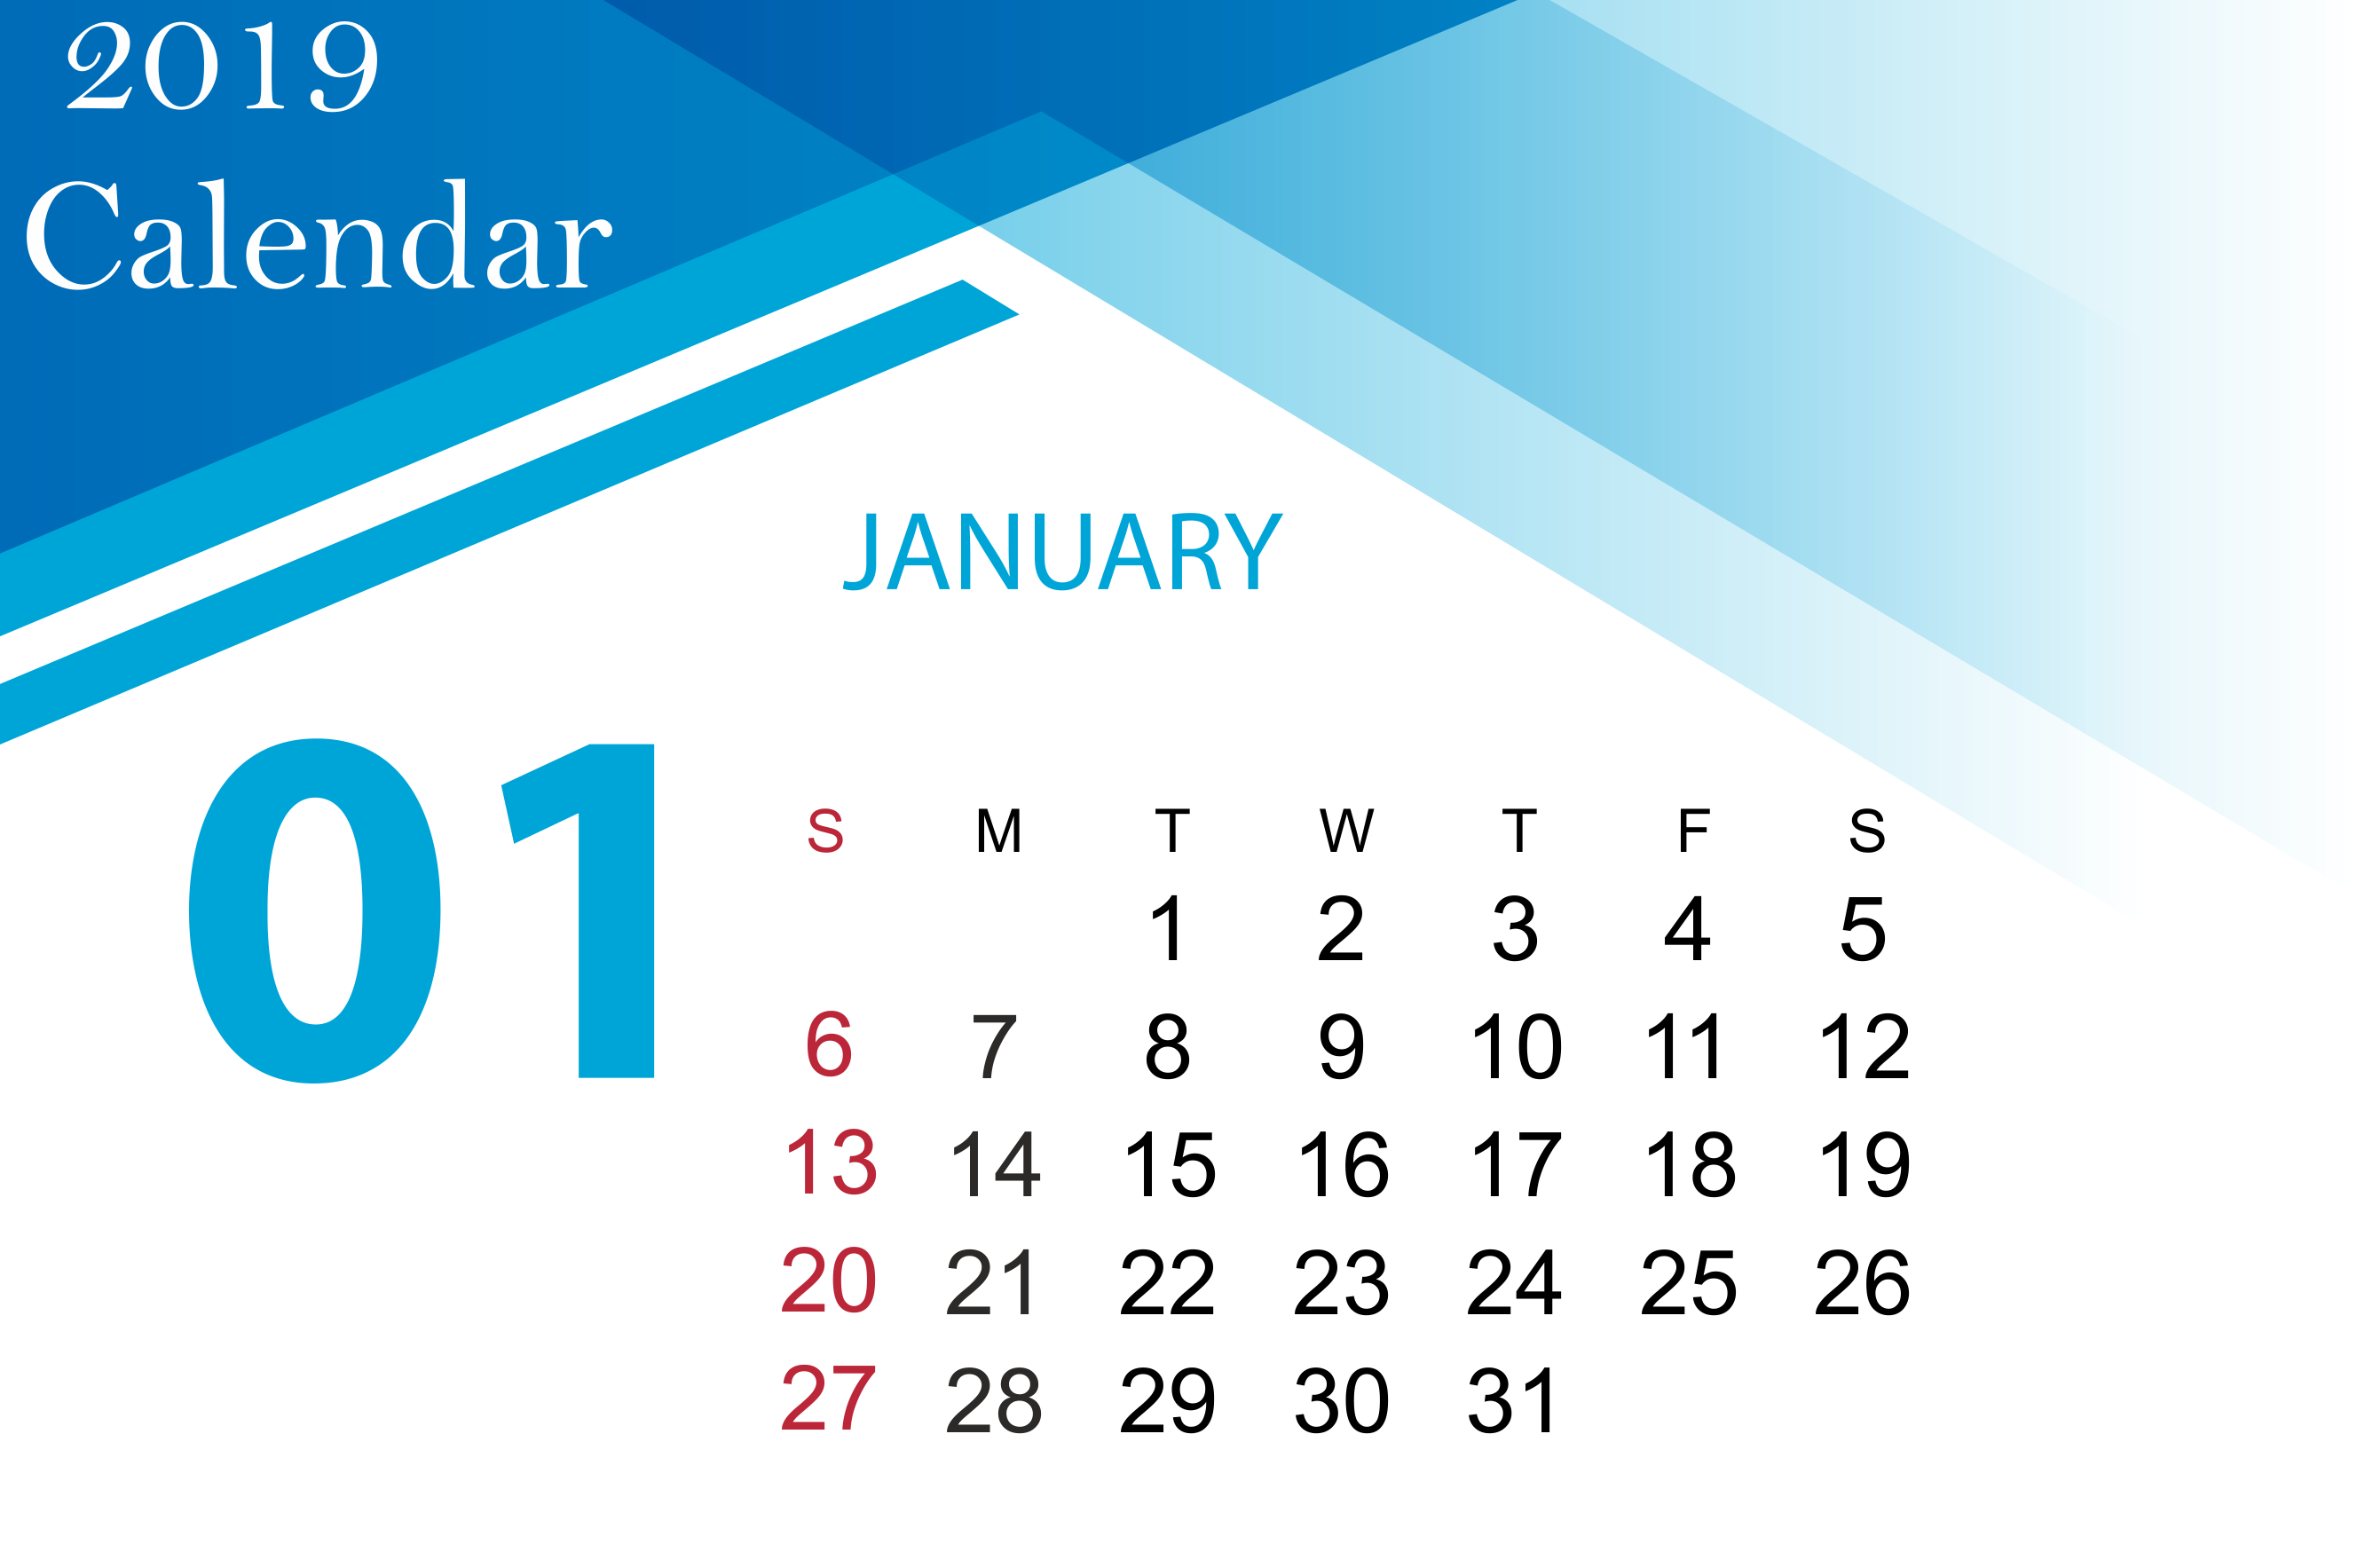 January 2019 Calendar Printable Wallpaper